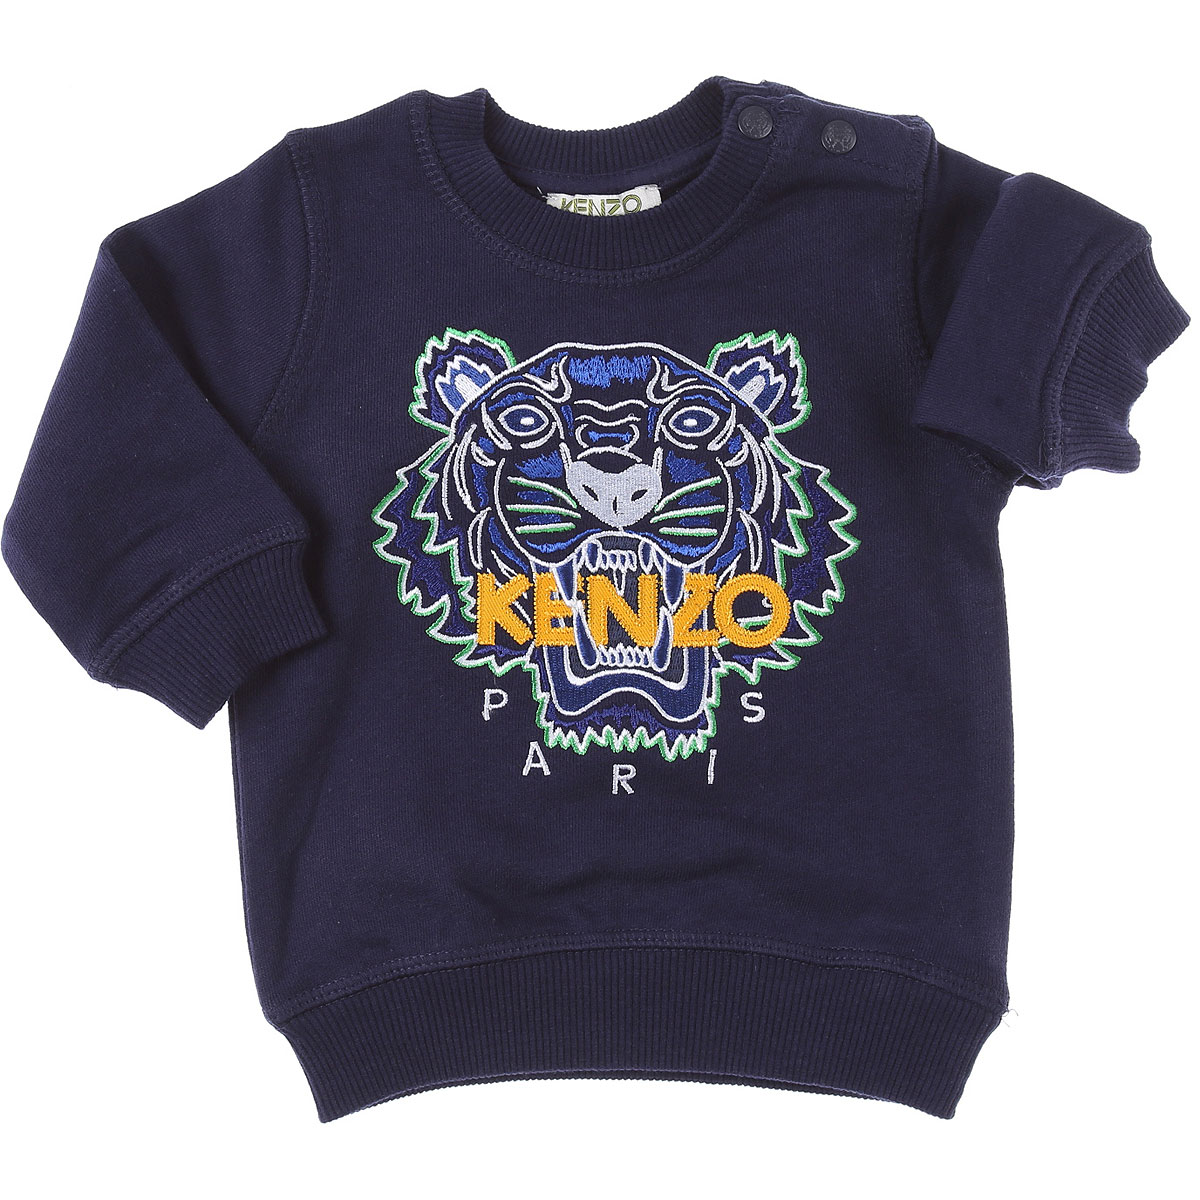 Kenzo Baby Sweatshirts & Hoodies for Boys On Sale, navy, Cotton, 2019, 18M 6M 9M